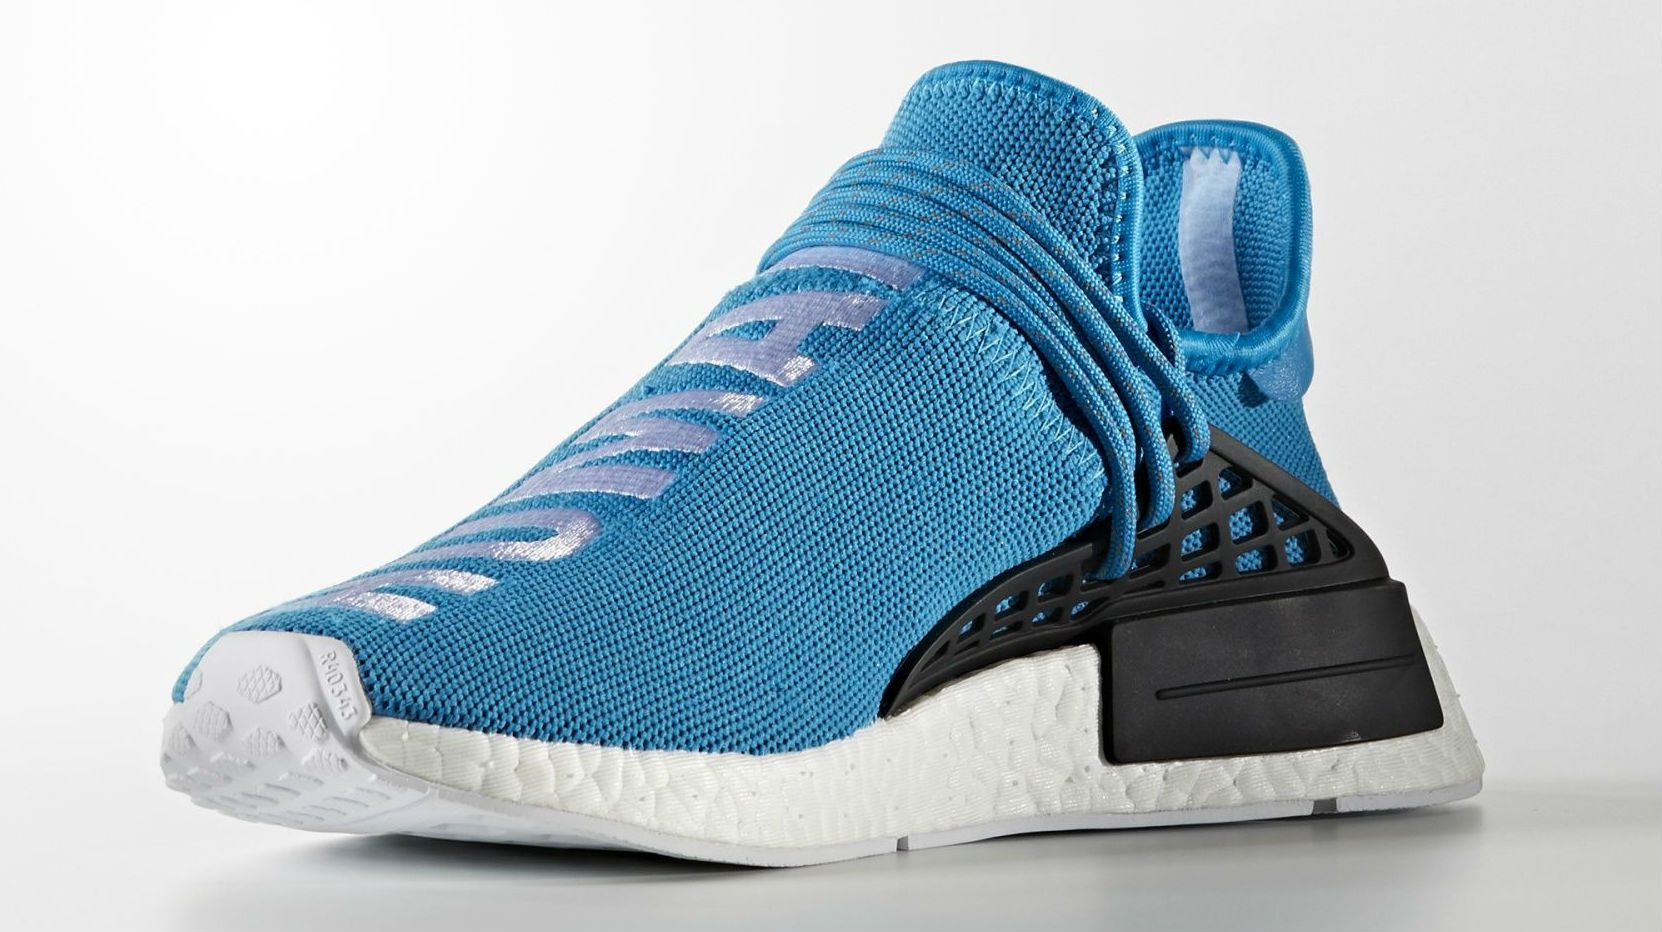 4df359024ed5 Blue Pharrell x Adidas NMD Human Race